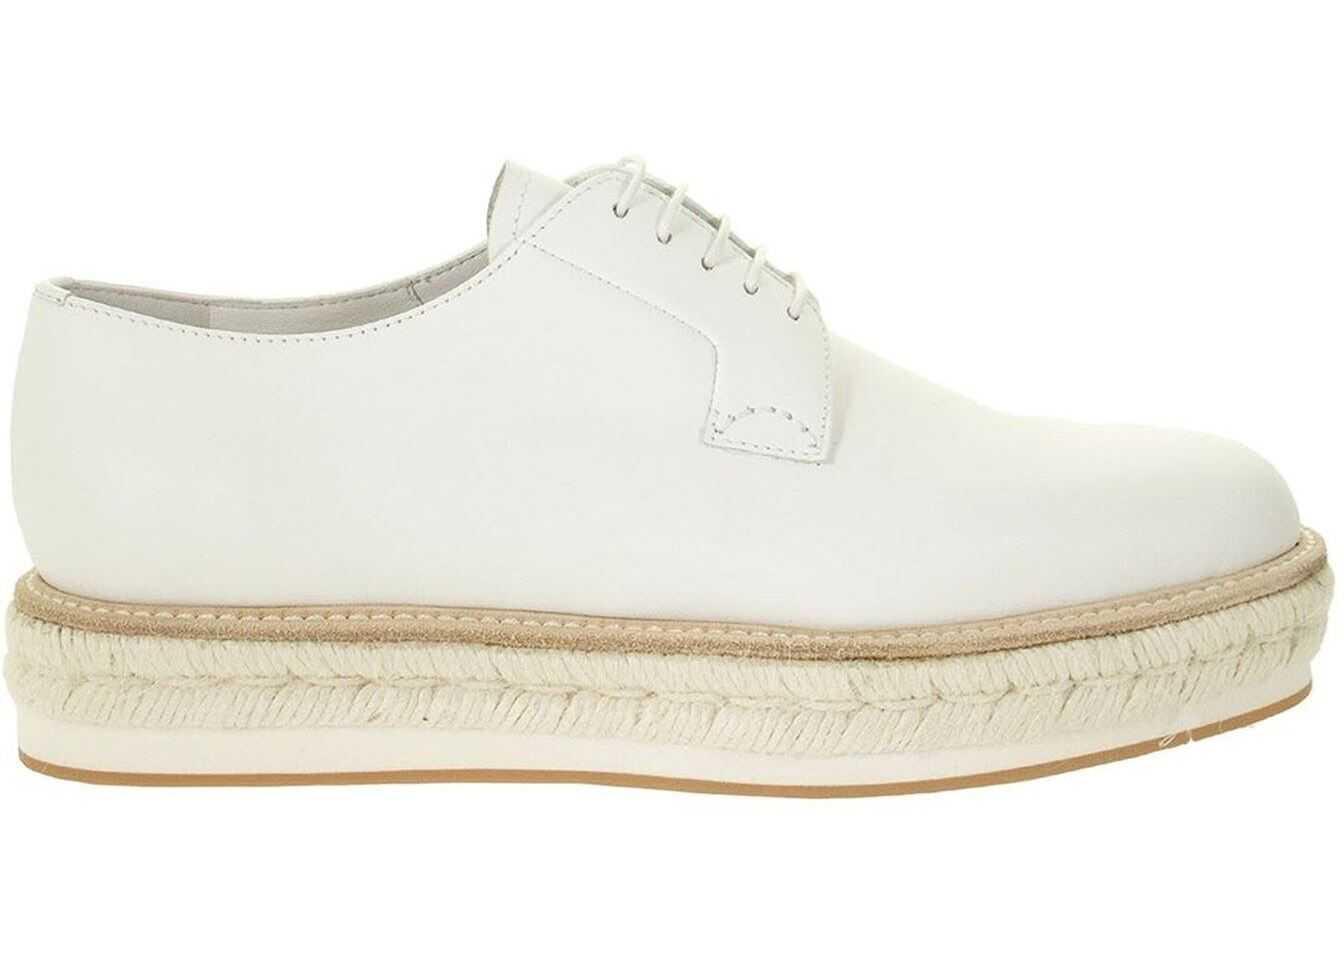 Church's Shannon Oxford Shoes In White DE02239ACEF0ABK White imagine b-mall.ro